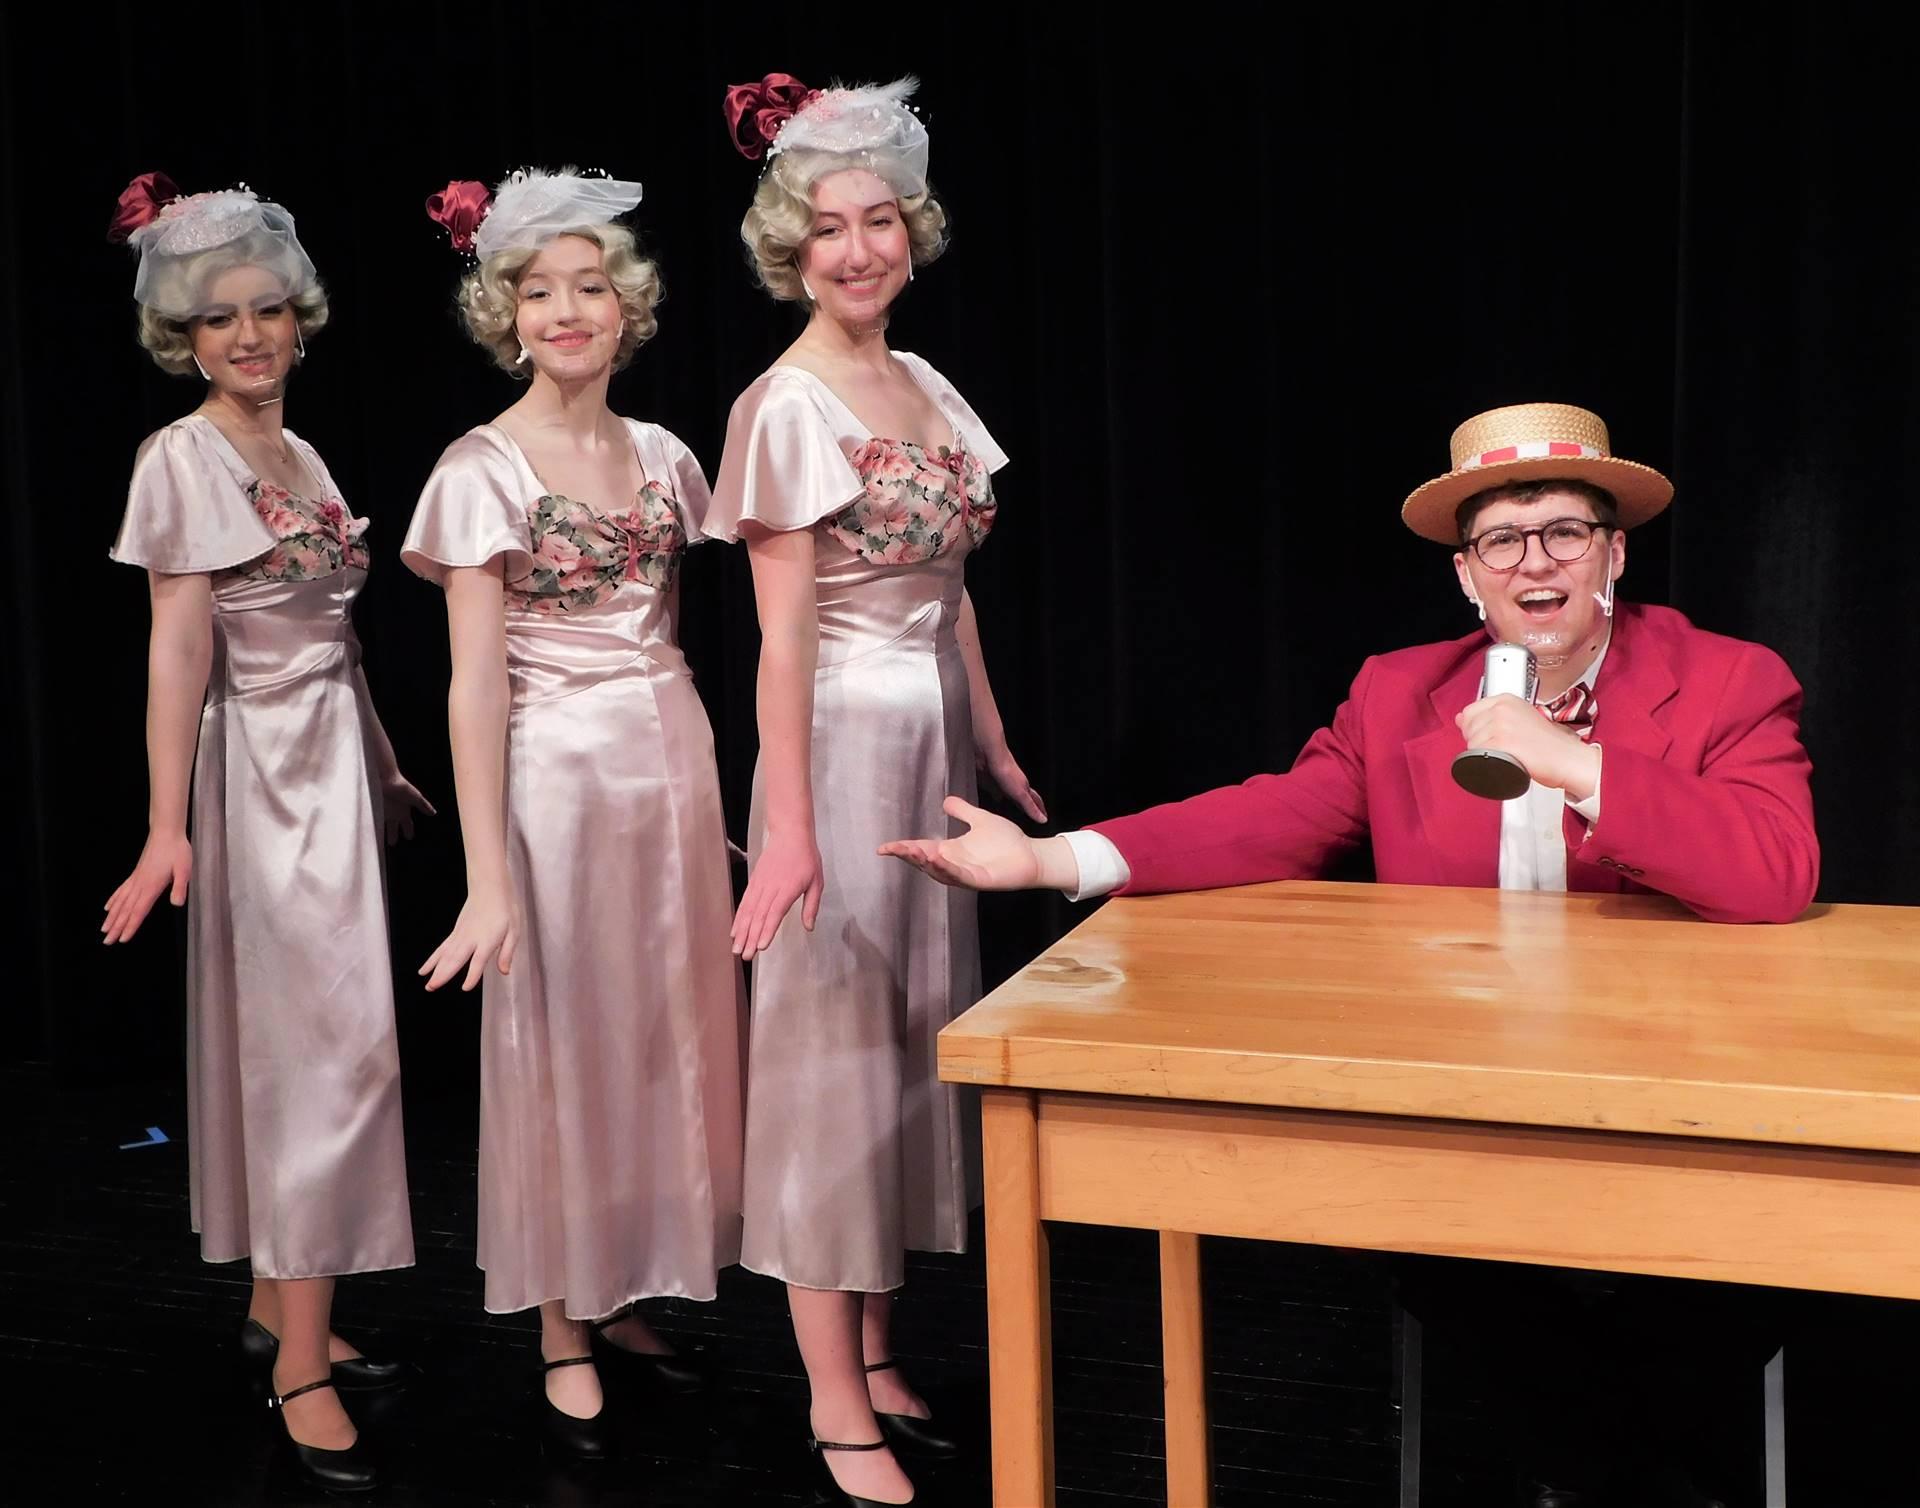 Bert Healy and the Boylan Sisters